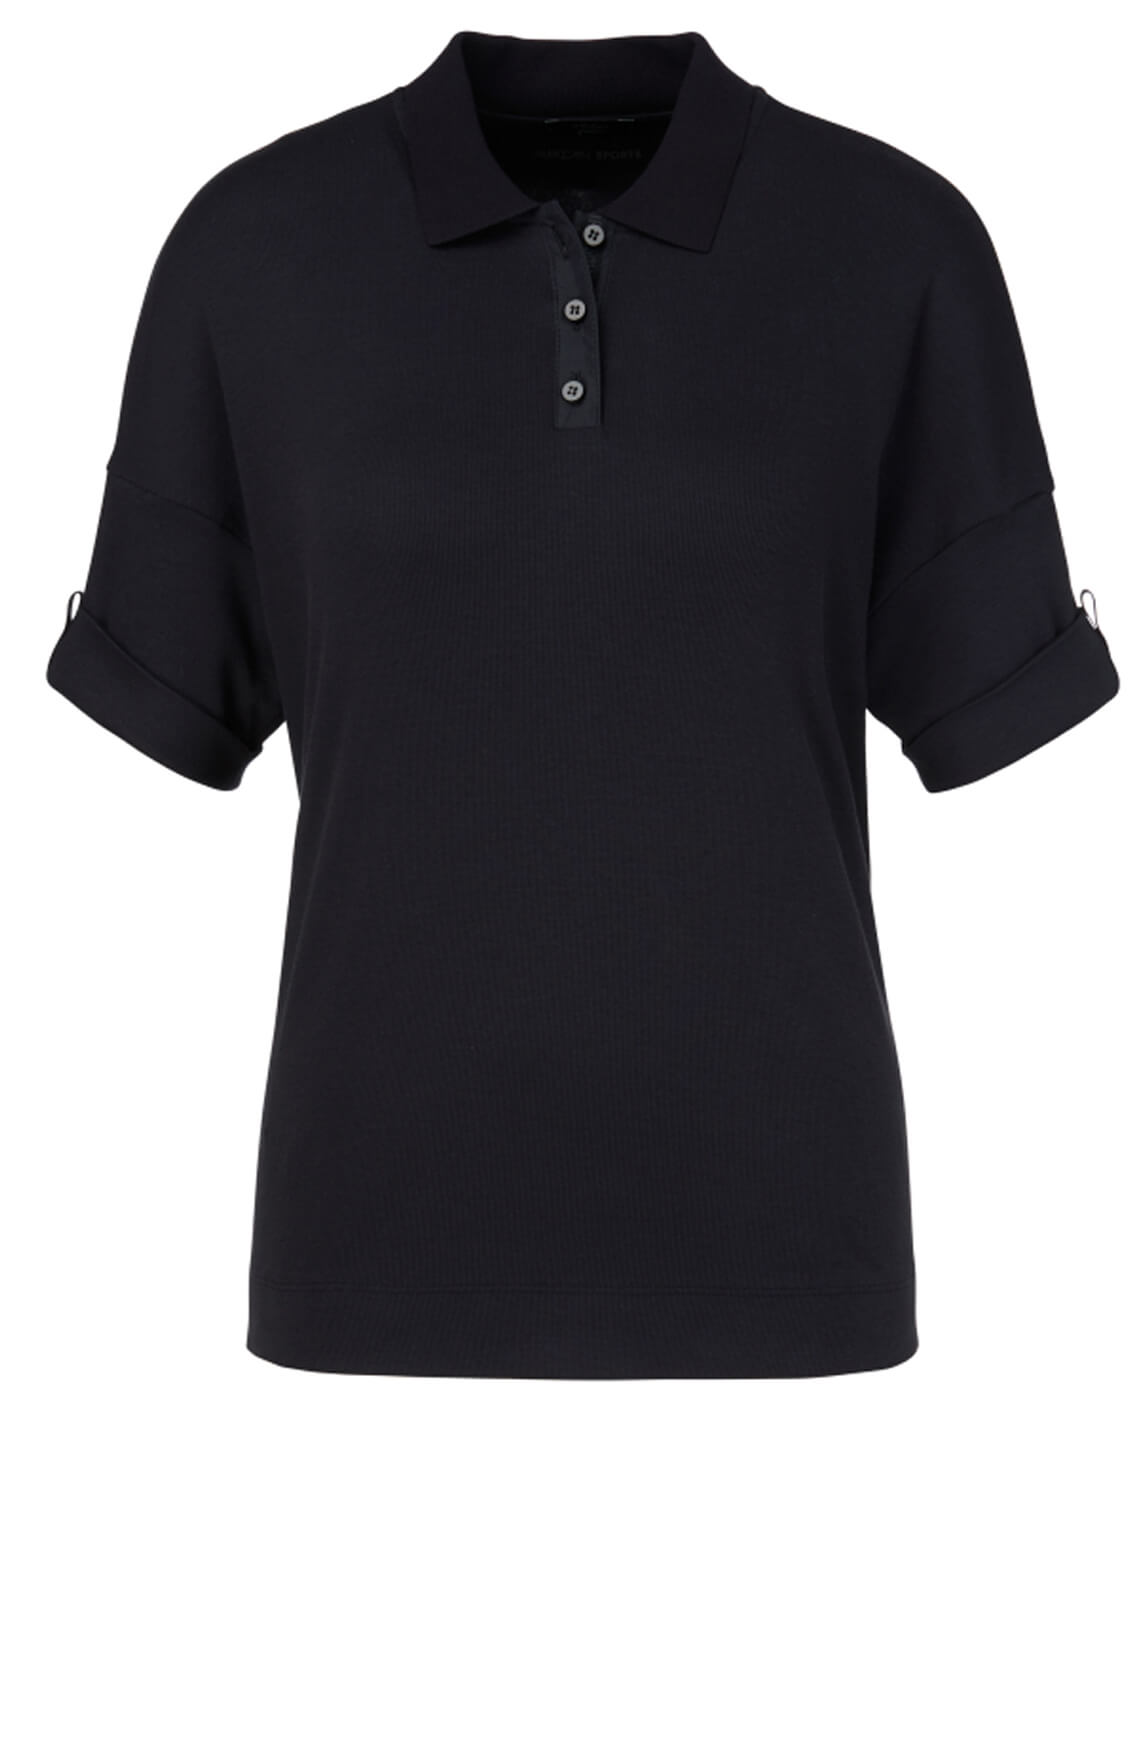 Marccain Sports Dames Poloshirt Blauw